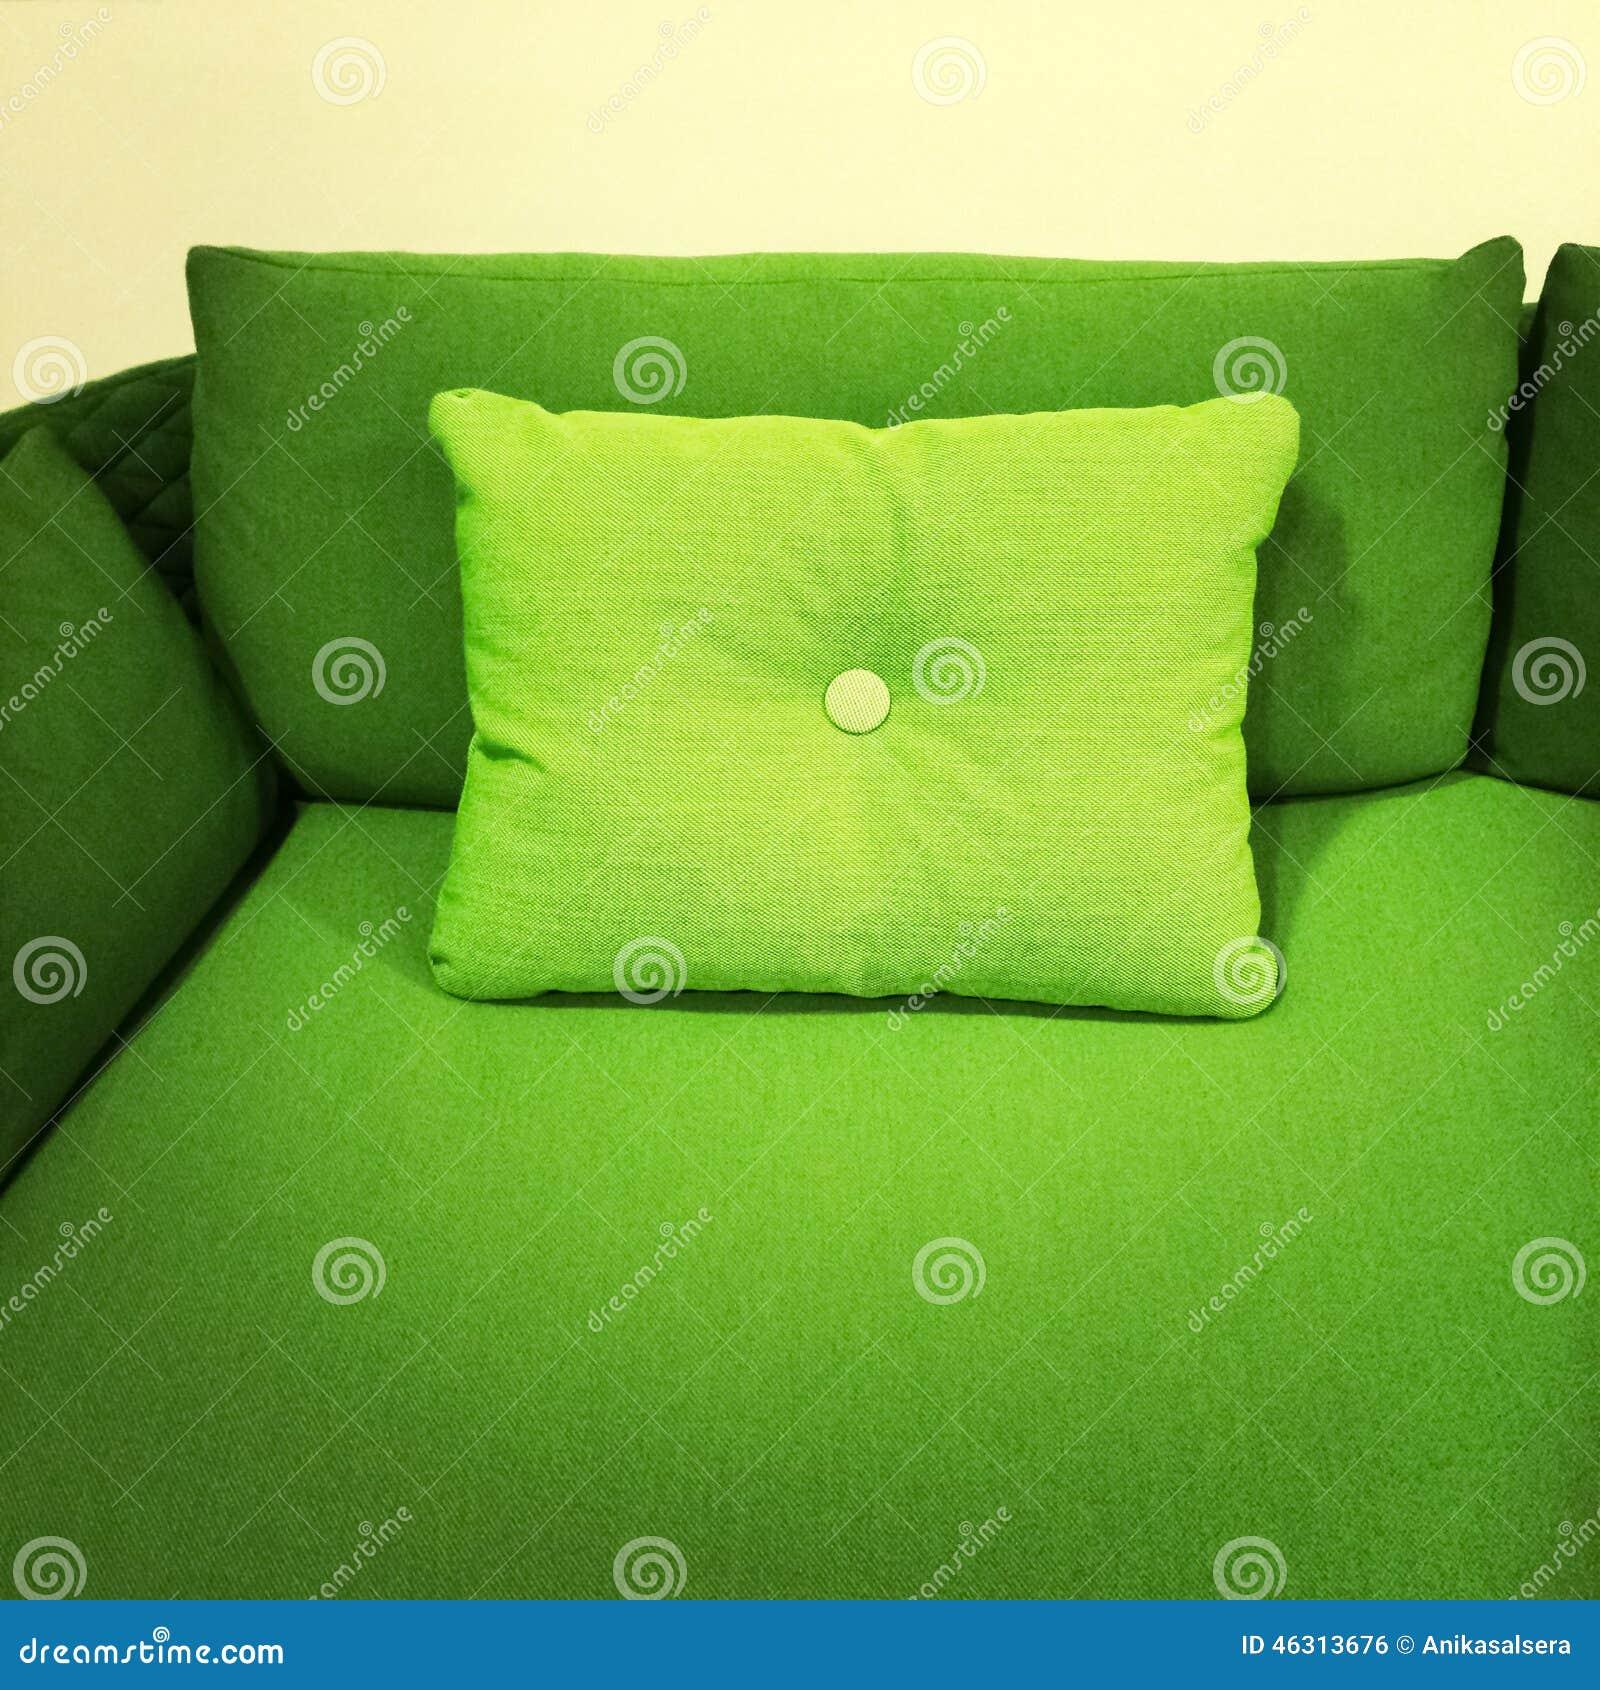 bright green sofa with cushion stock photo image 46313676